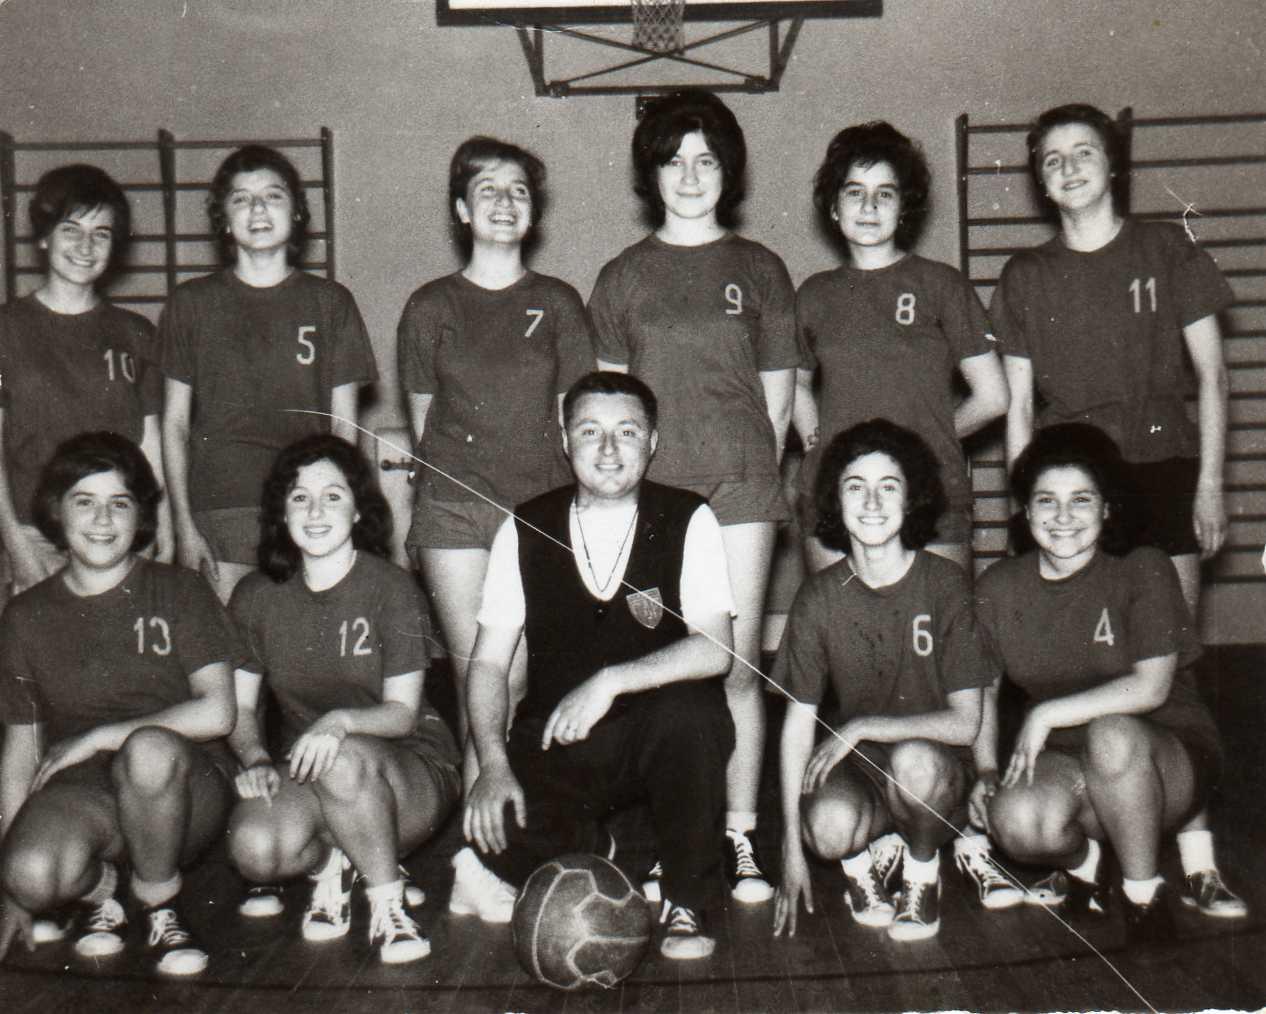 camp-to-prom-ne-femm-le-1960-1961